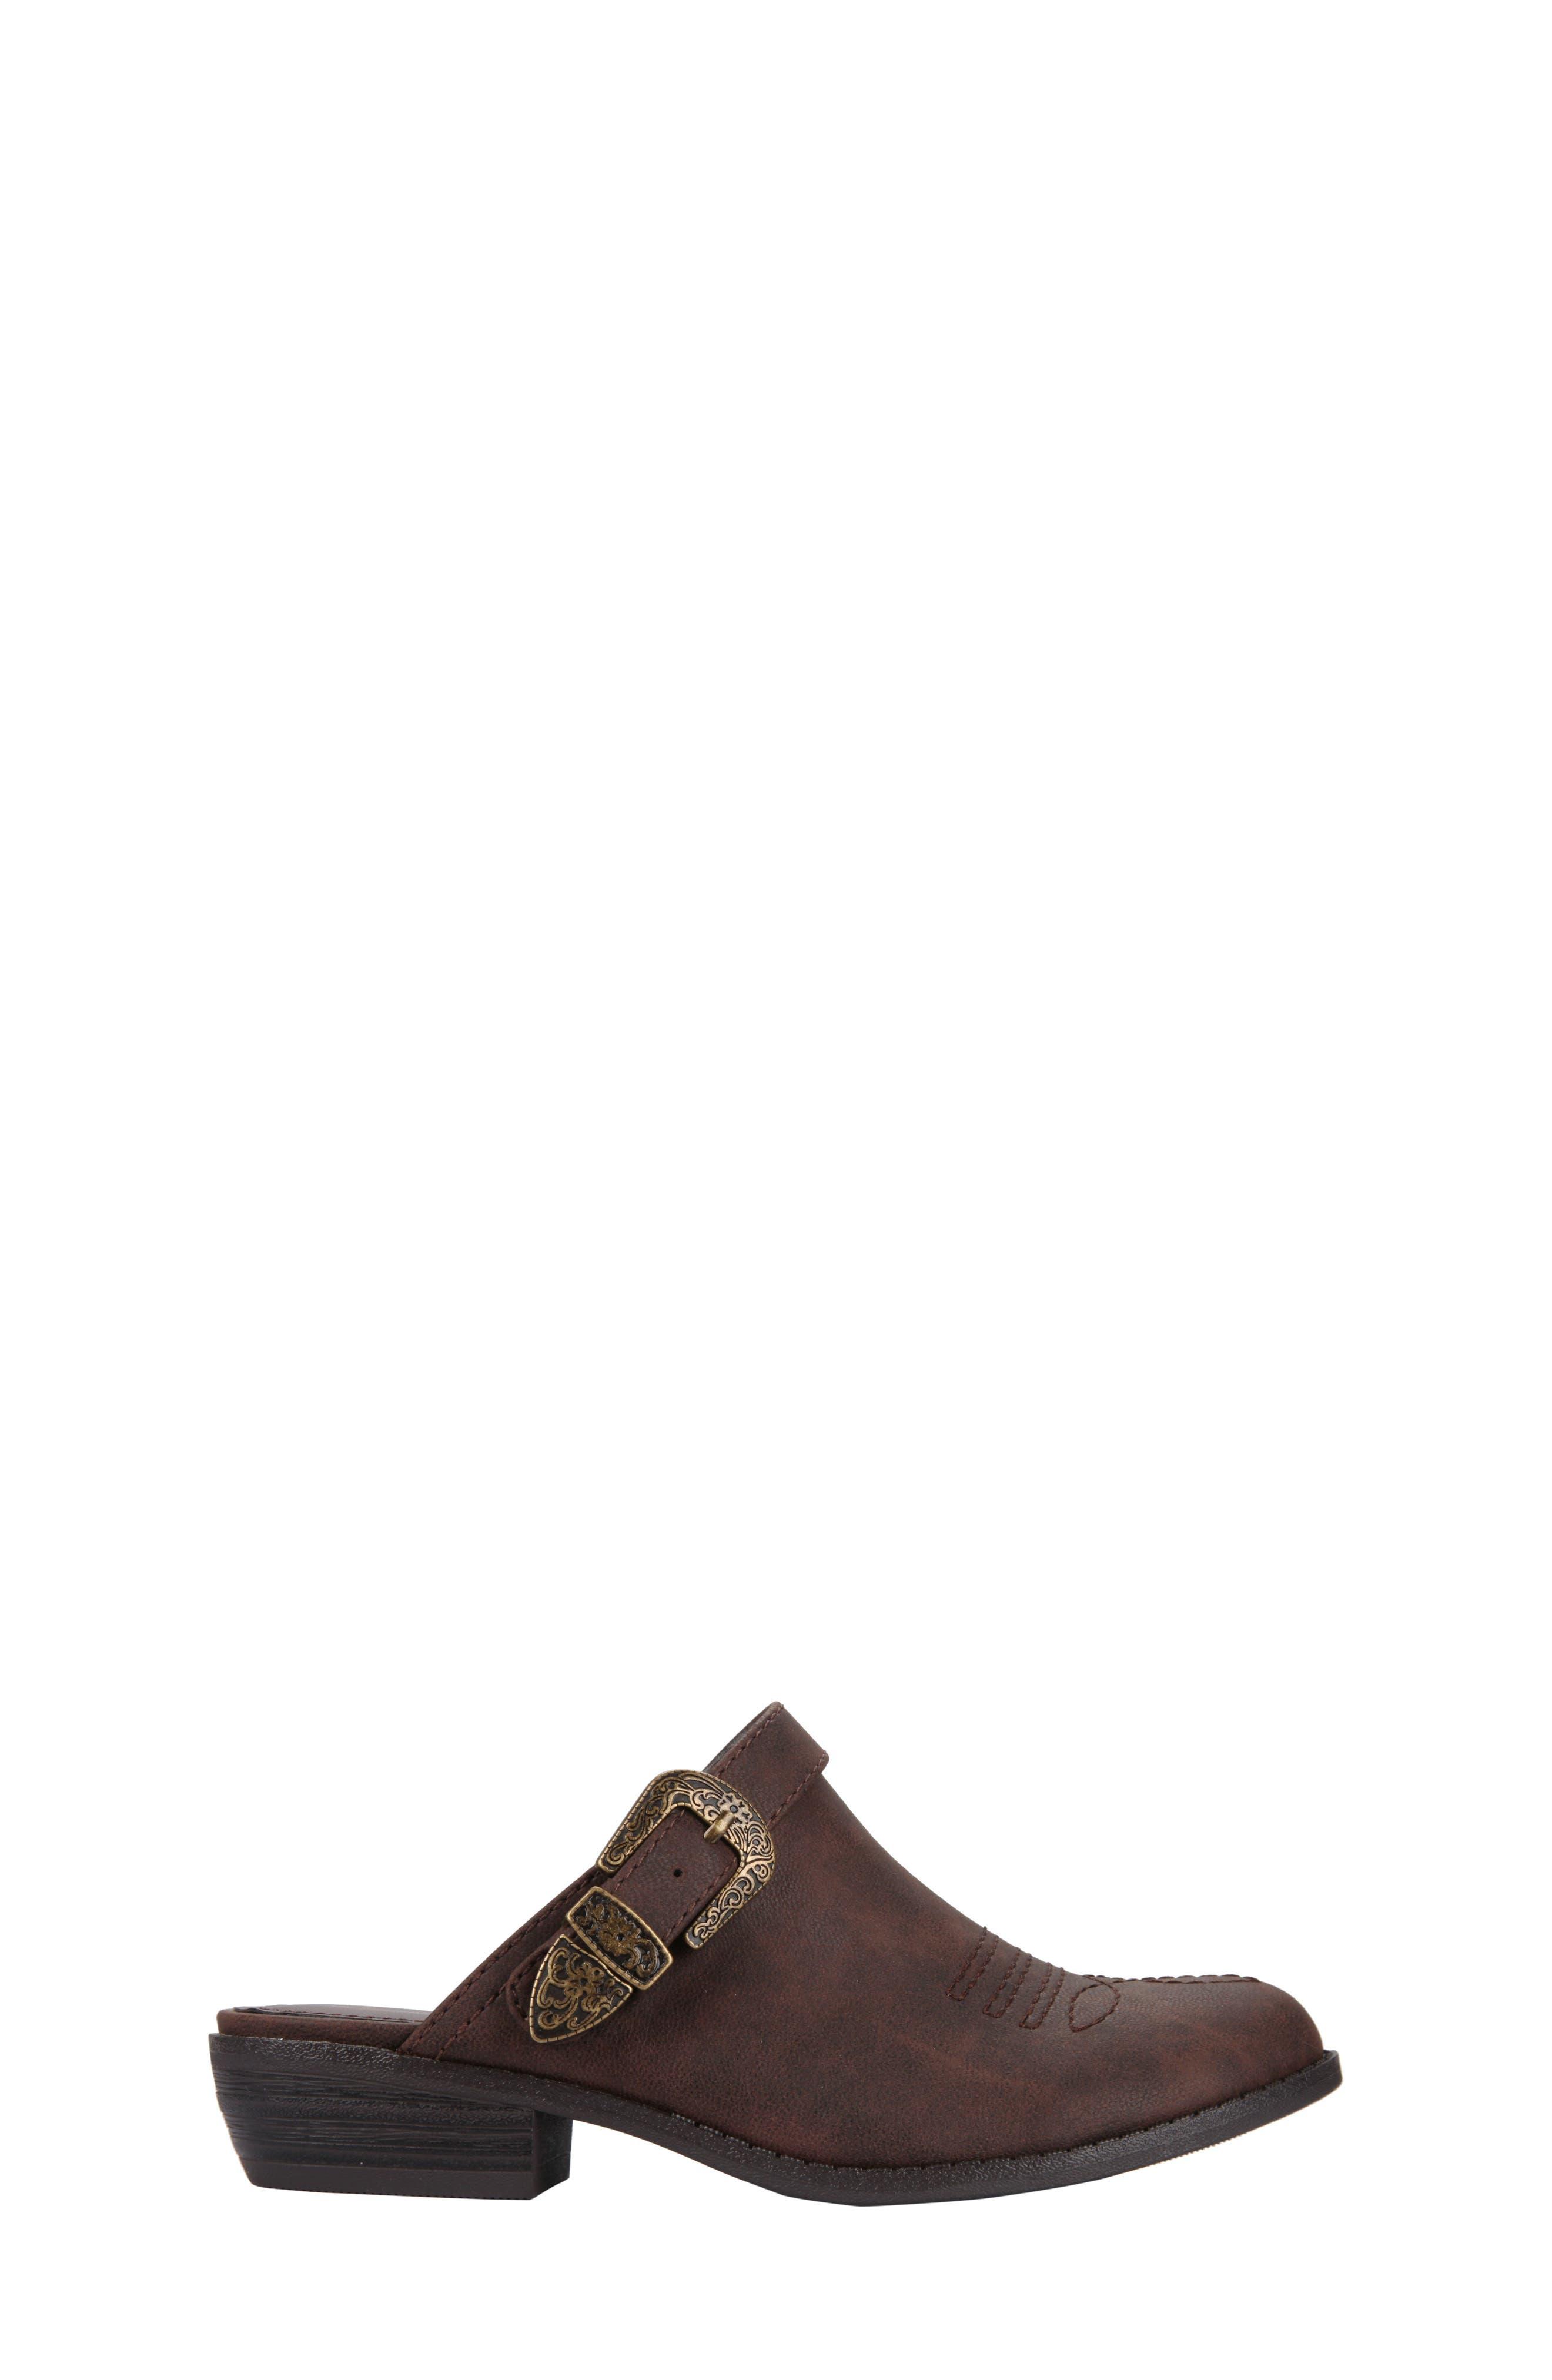 Deb Swivel Strap Clog,                             Alternate thumbnail 3, color,                             Brown Faux Leather